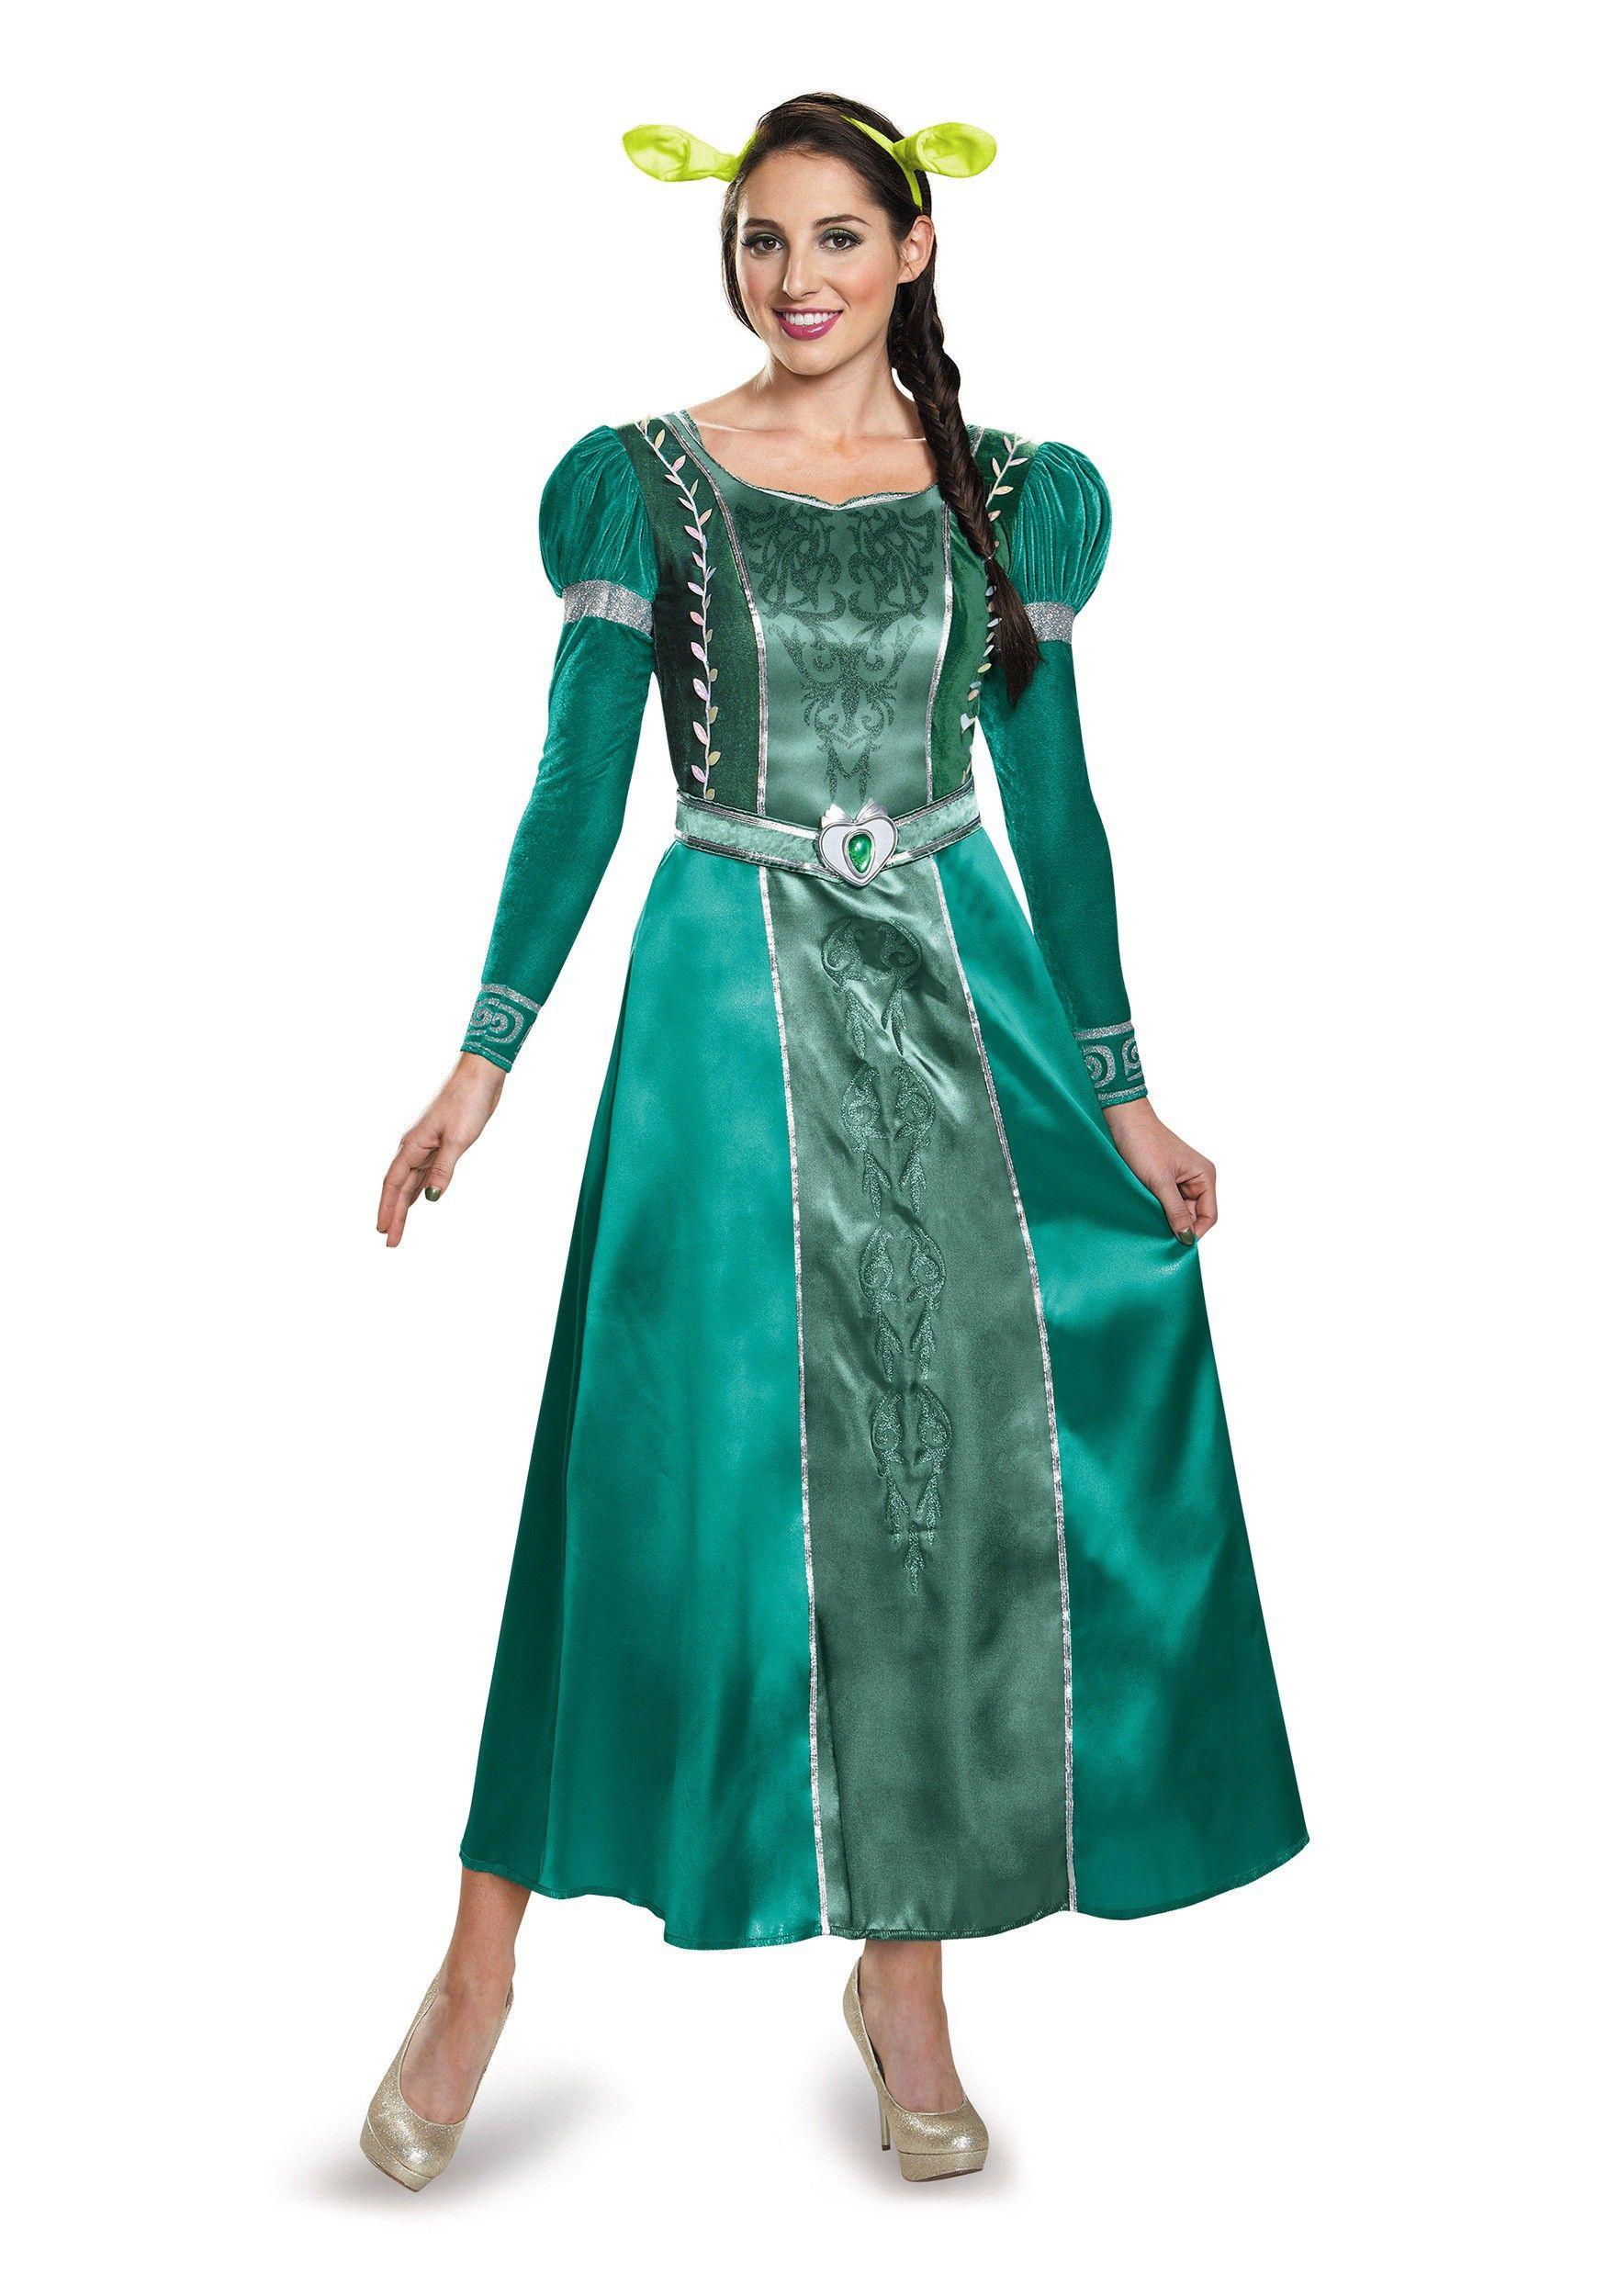 Adult fiona plus size costumes photos 855